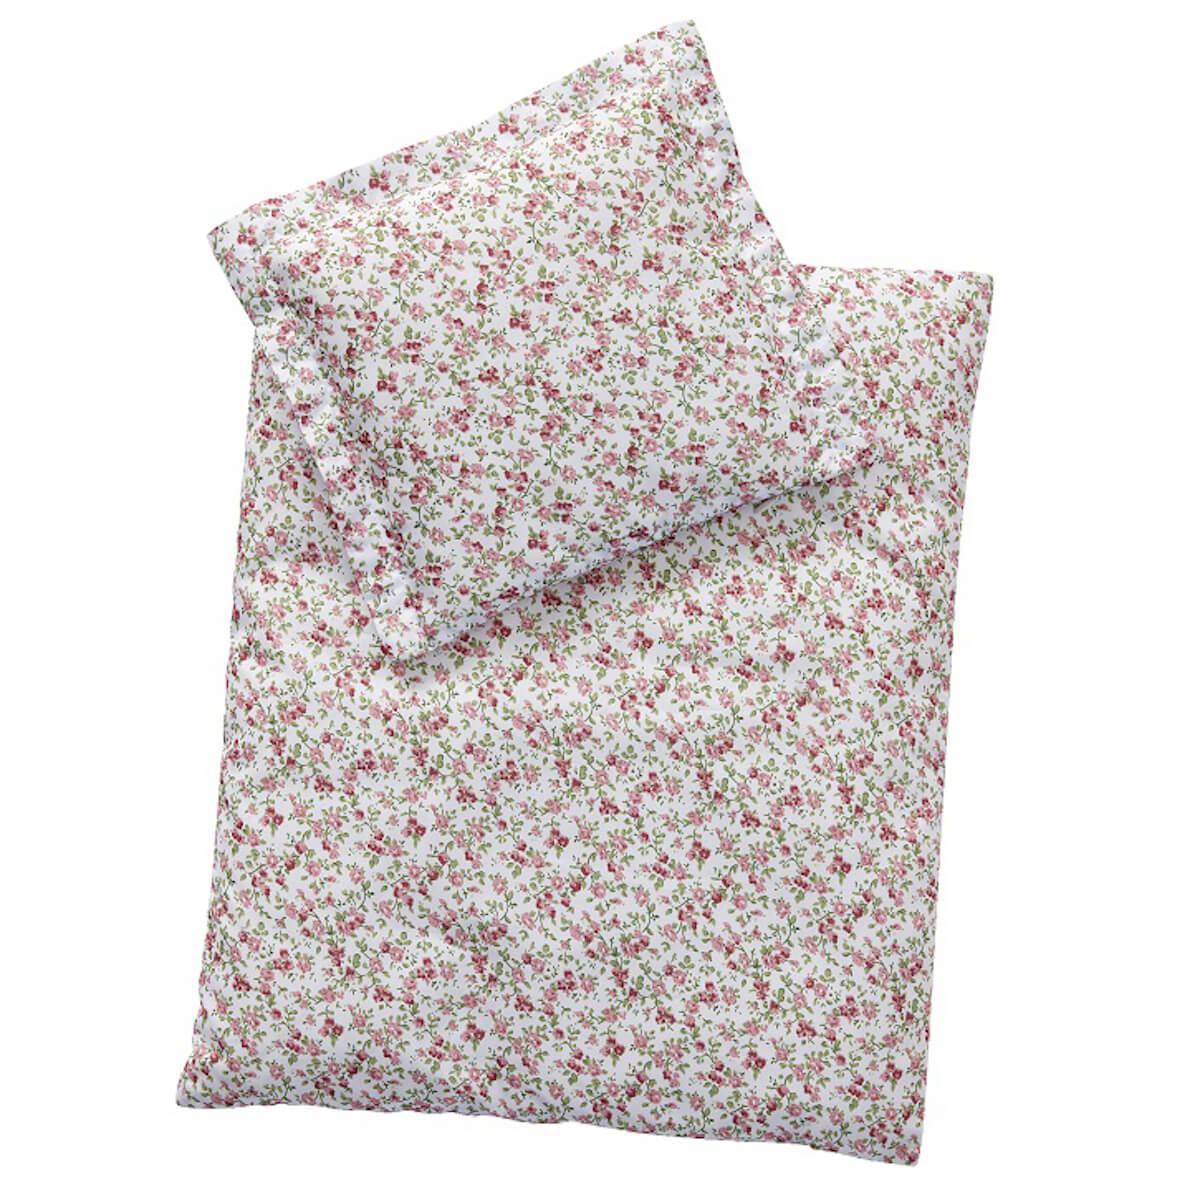 Edredón-almohada cama muñecas 44x37cm Astrup Dusty rose